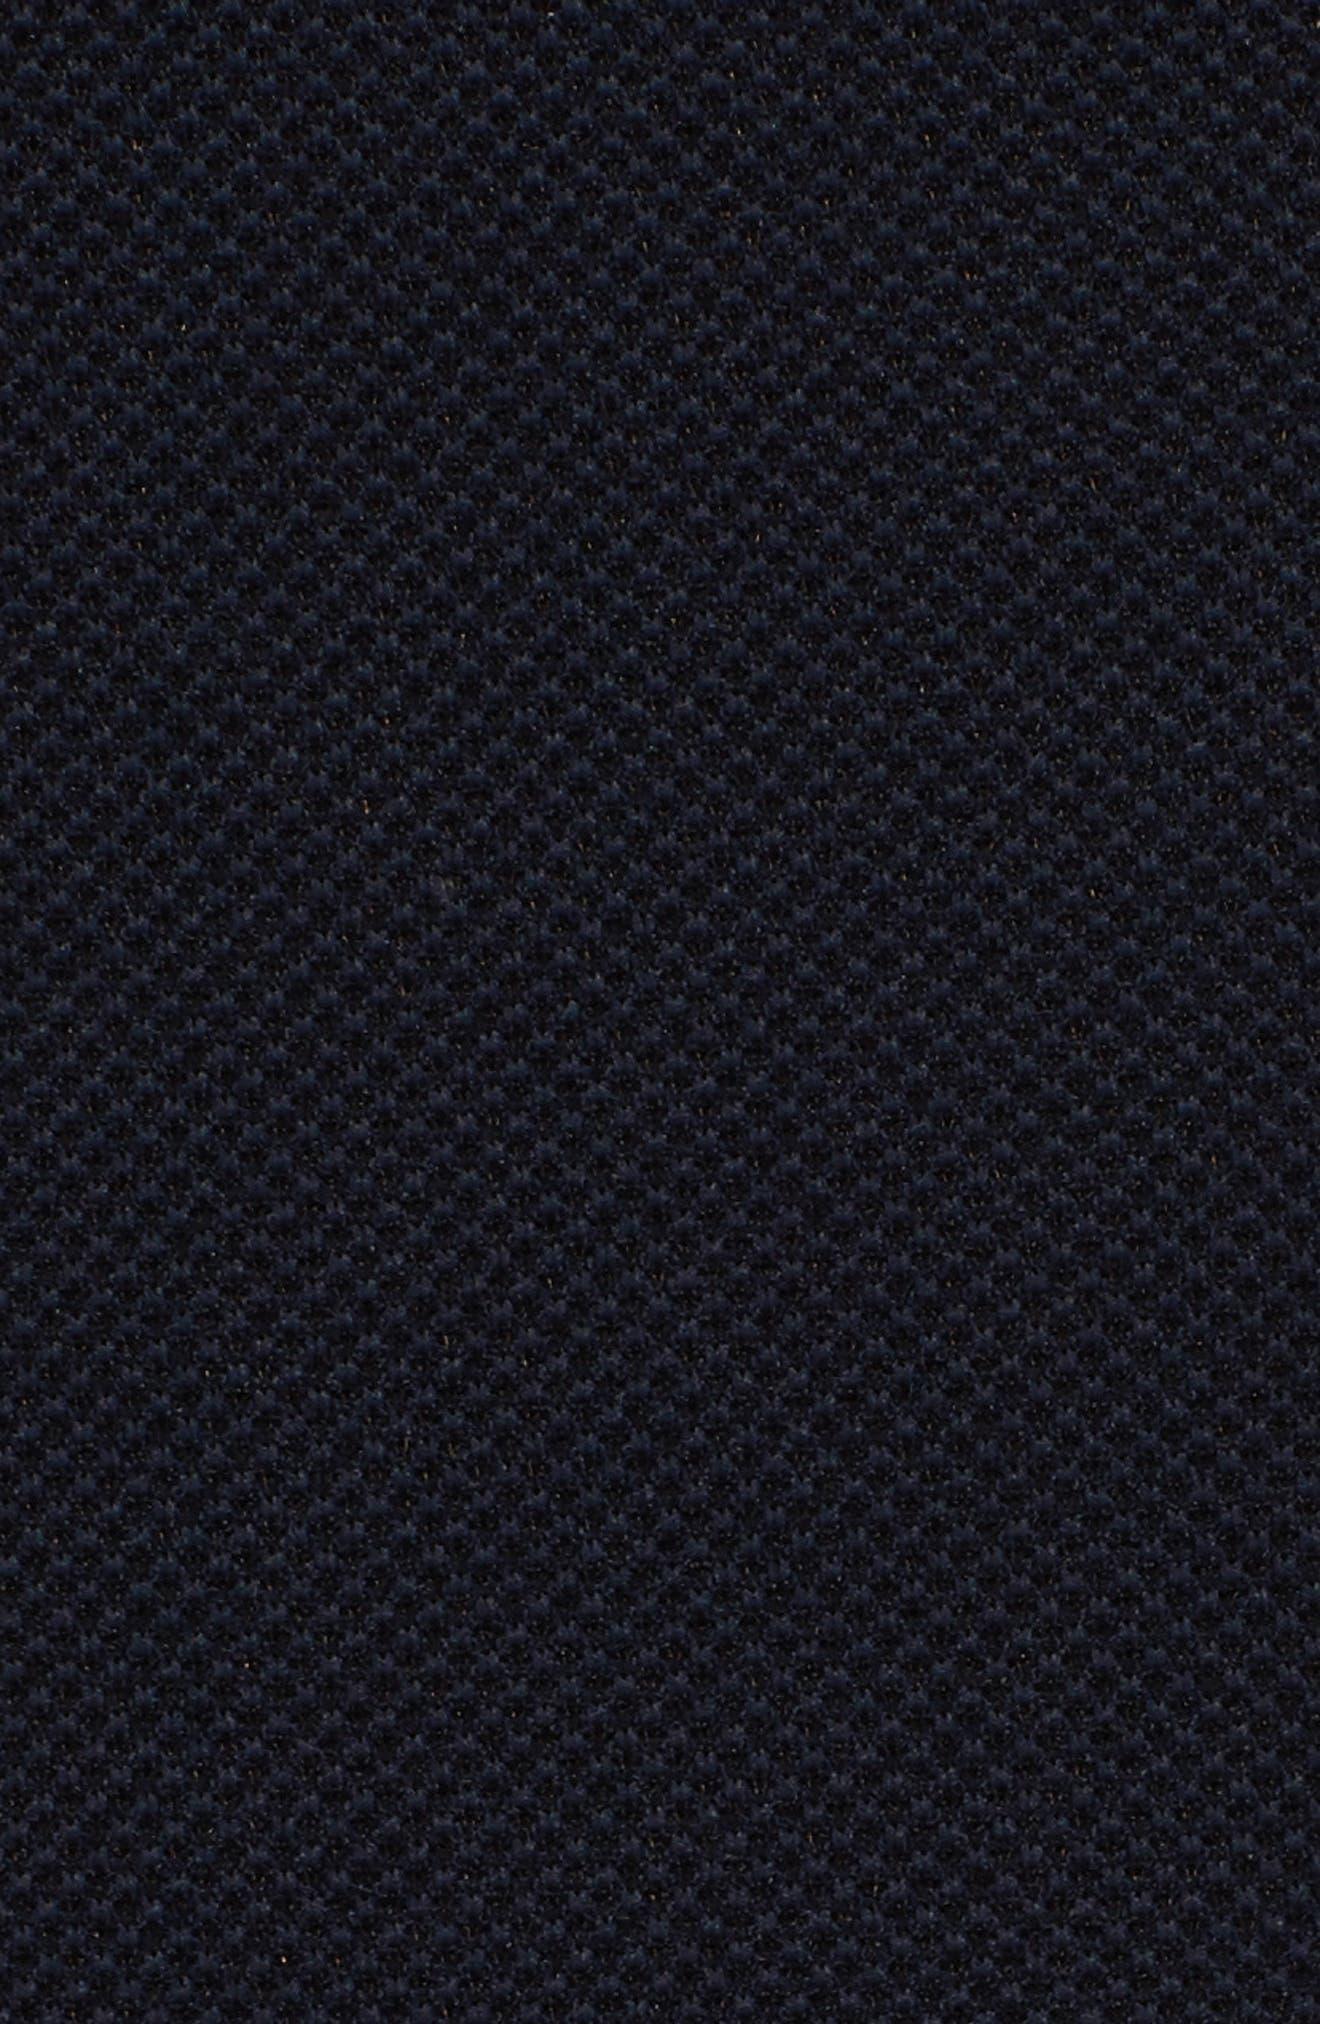 Piqué Skinny Pants,                             Alternate thumbnail 5, color,                             001